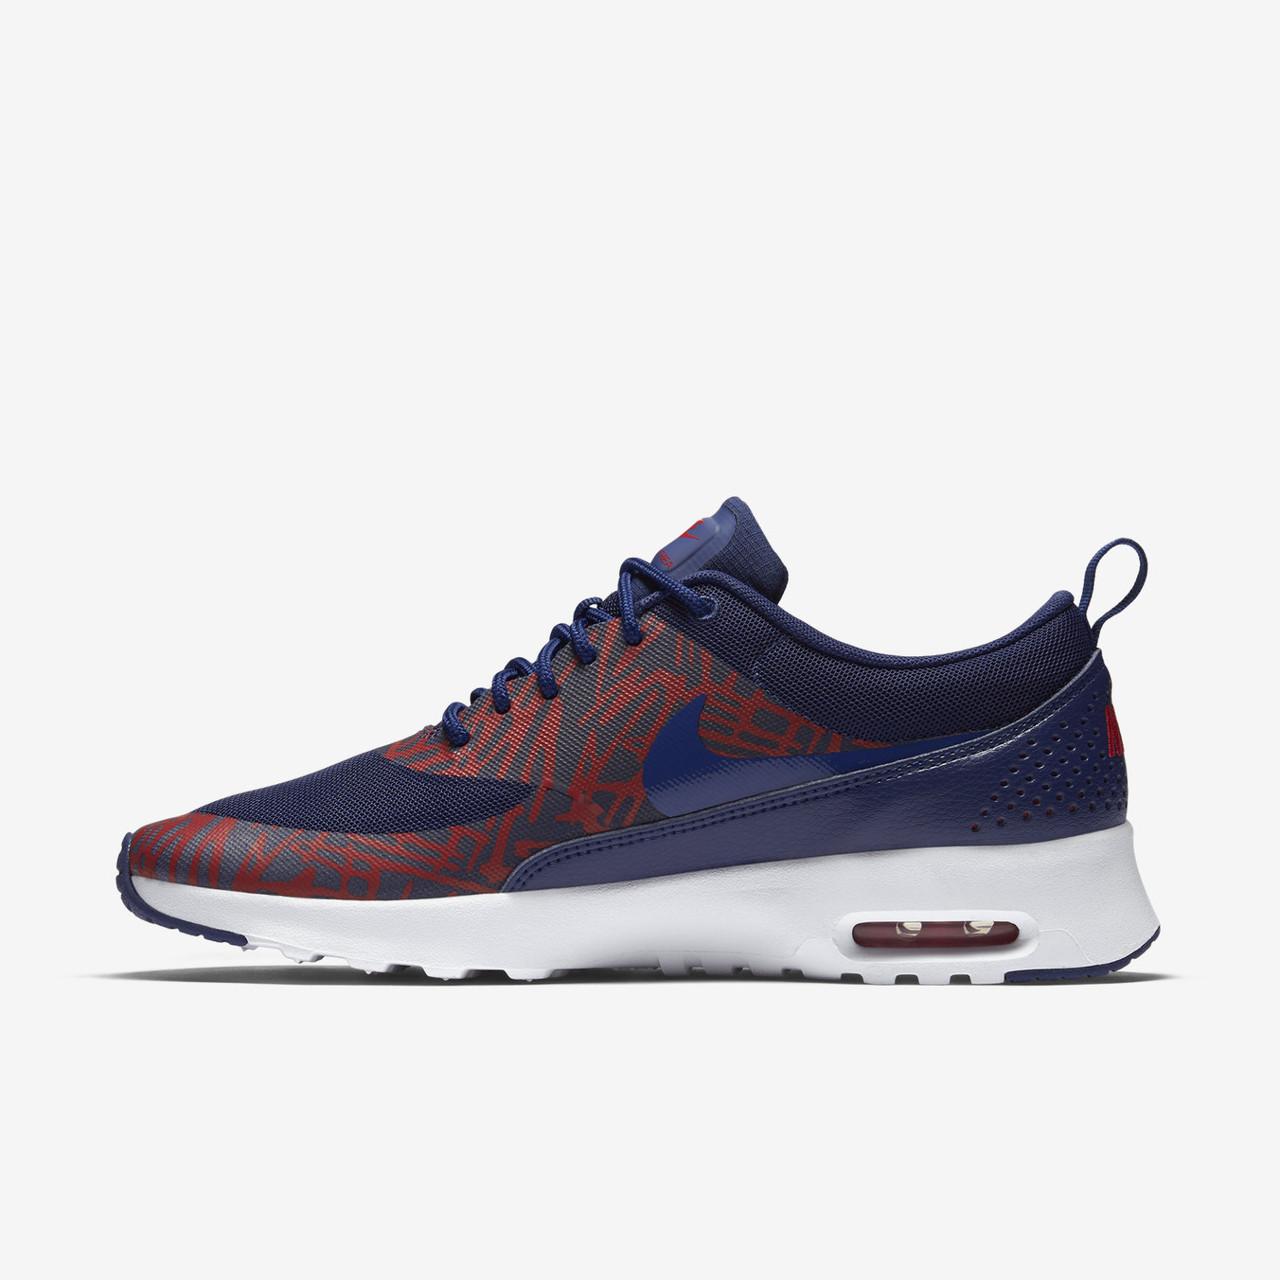 7e88d758 ... Женские кроссовки Nike wmns air max thea print (Артикул: 599408-402),  ...